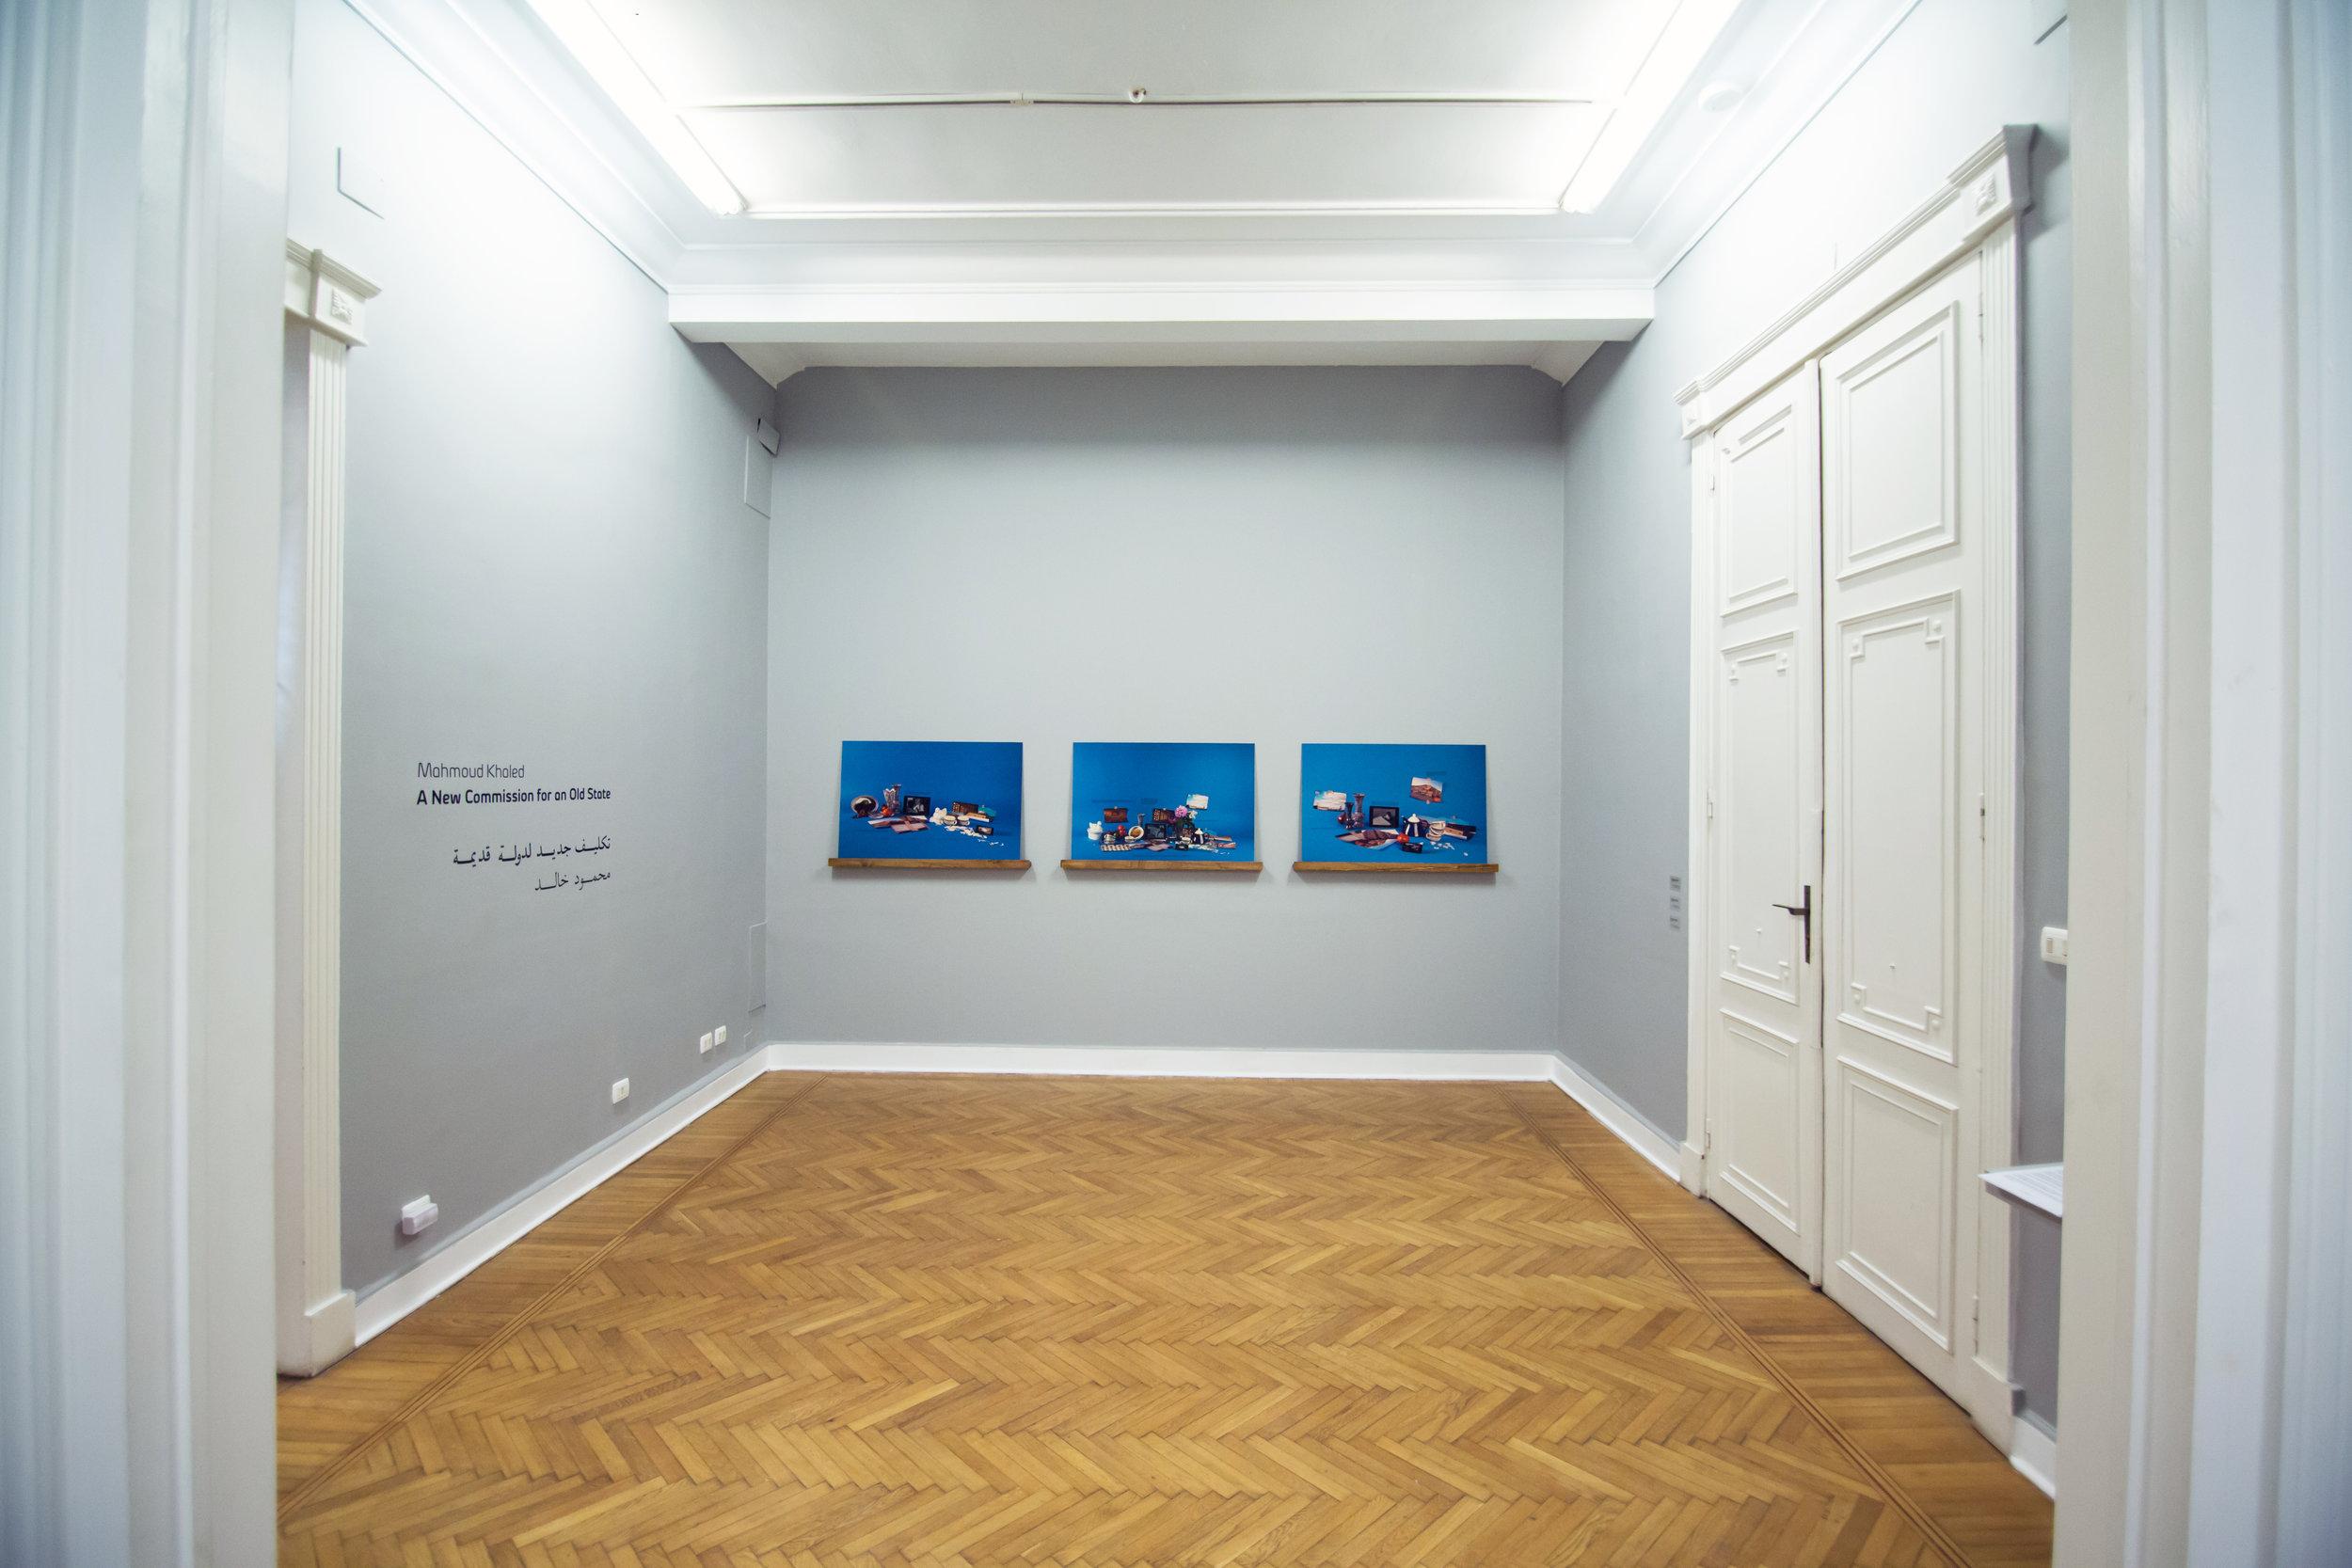 Gypsum-Gallery_Mahmoud-Khaled_Exhibition_ (6).jpg